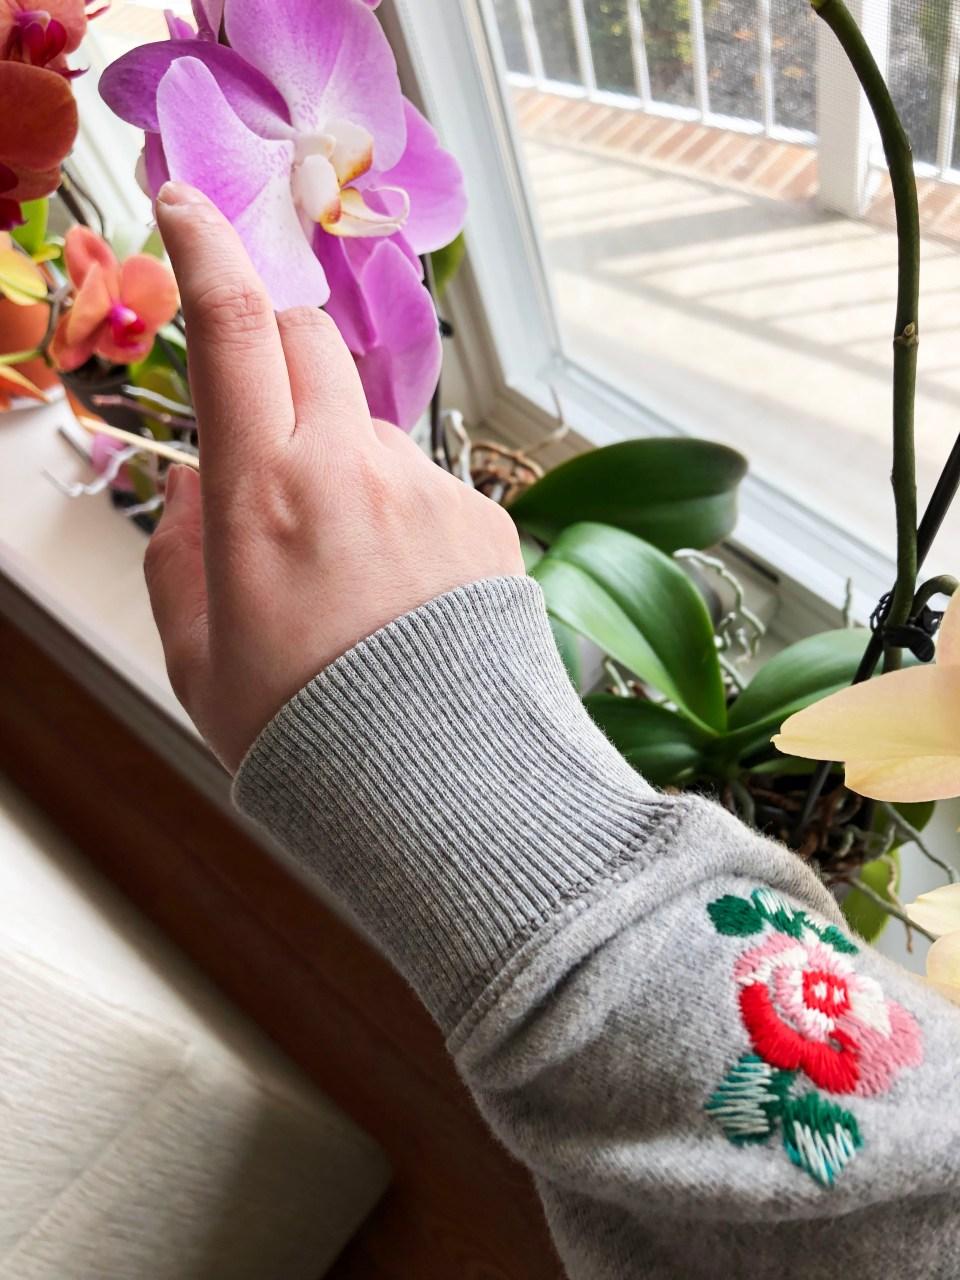 Floral Embroidered Sweatshirt 15